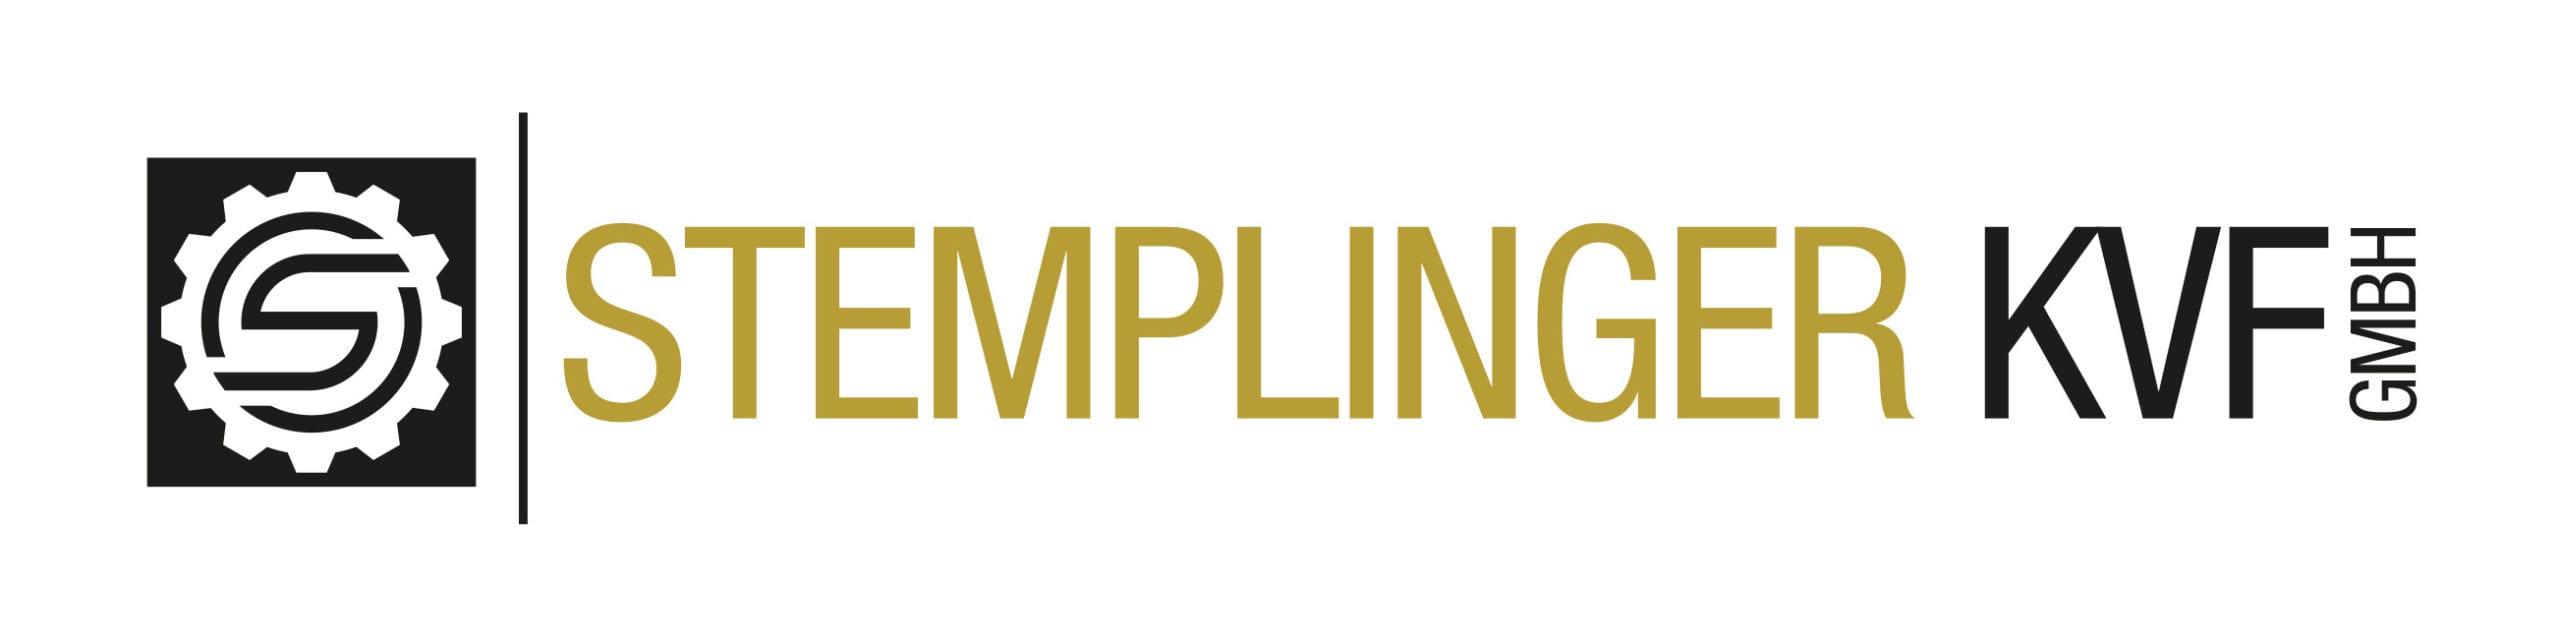 Stemplinger